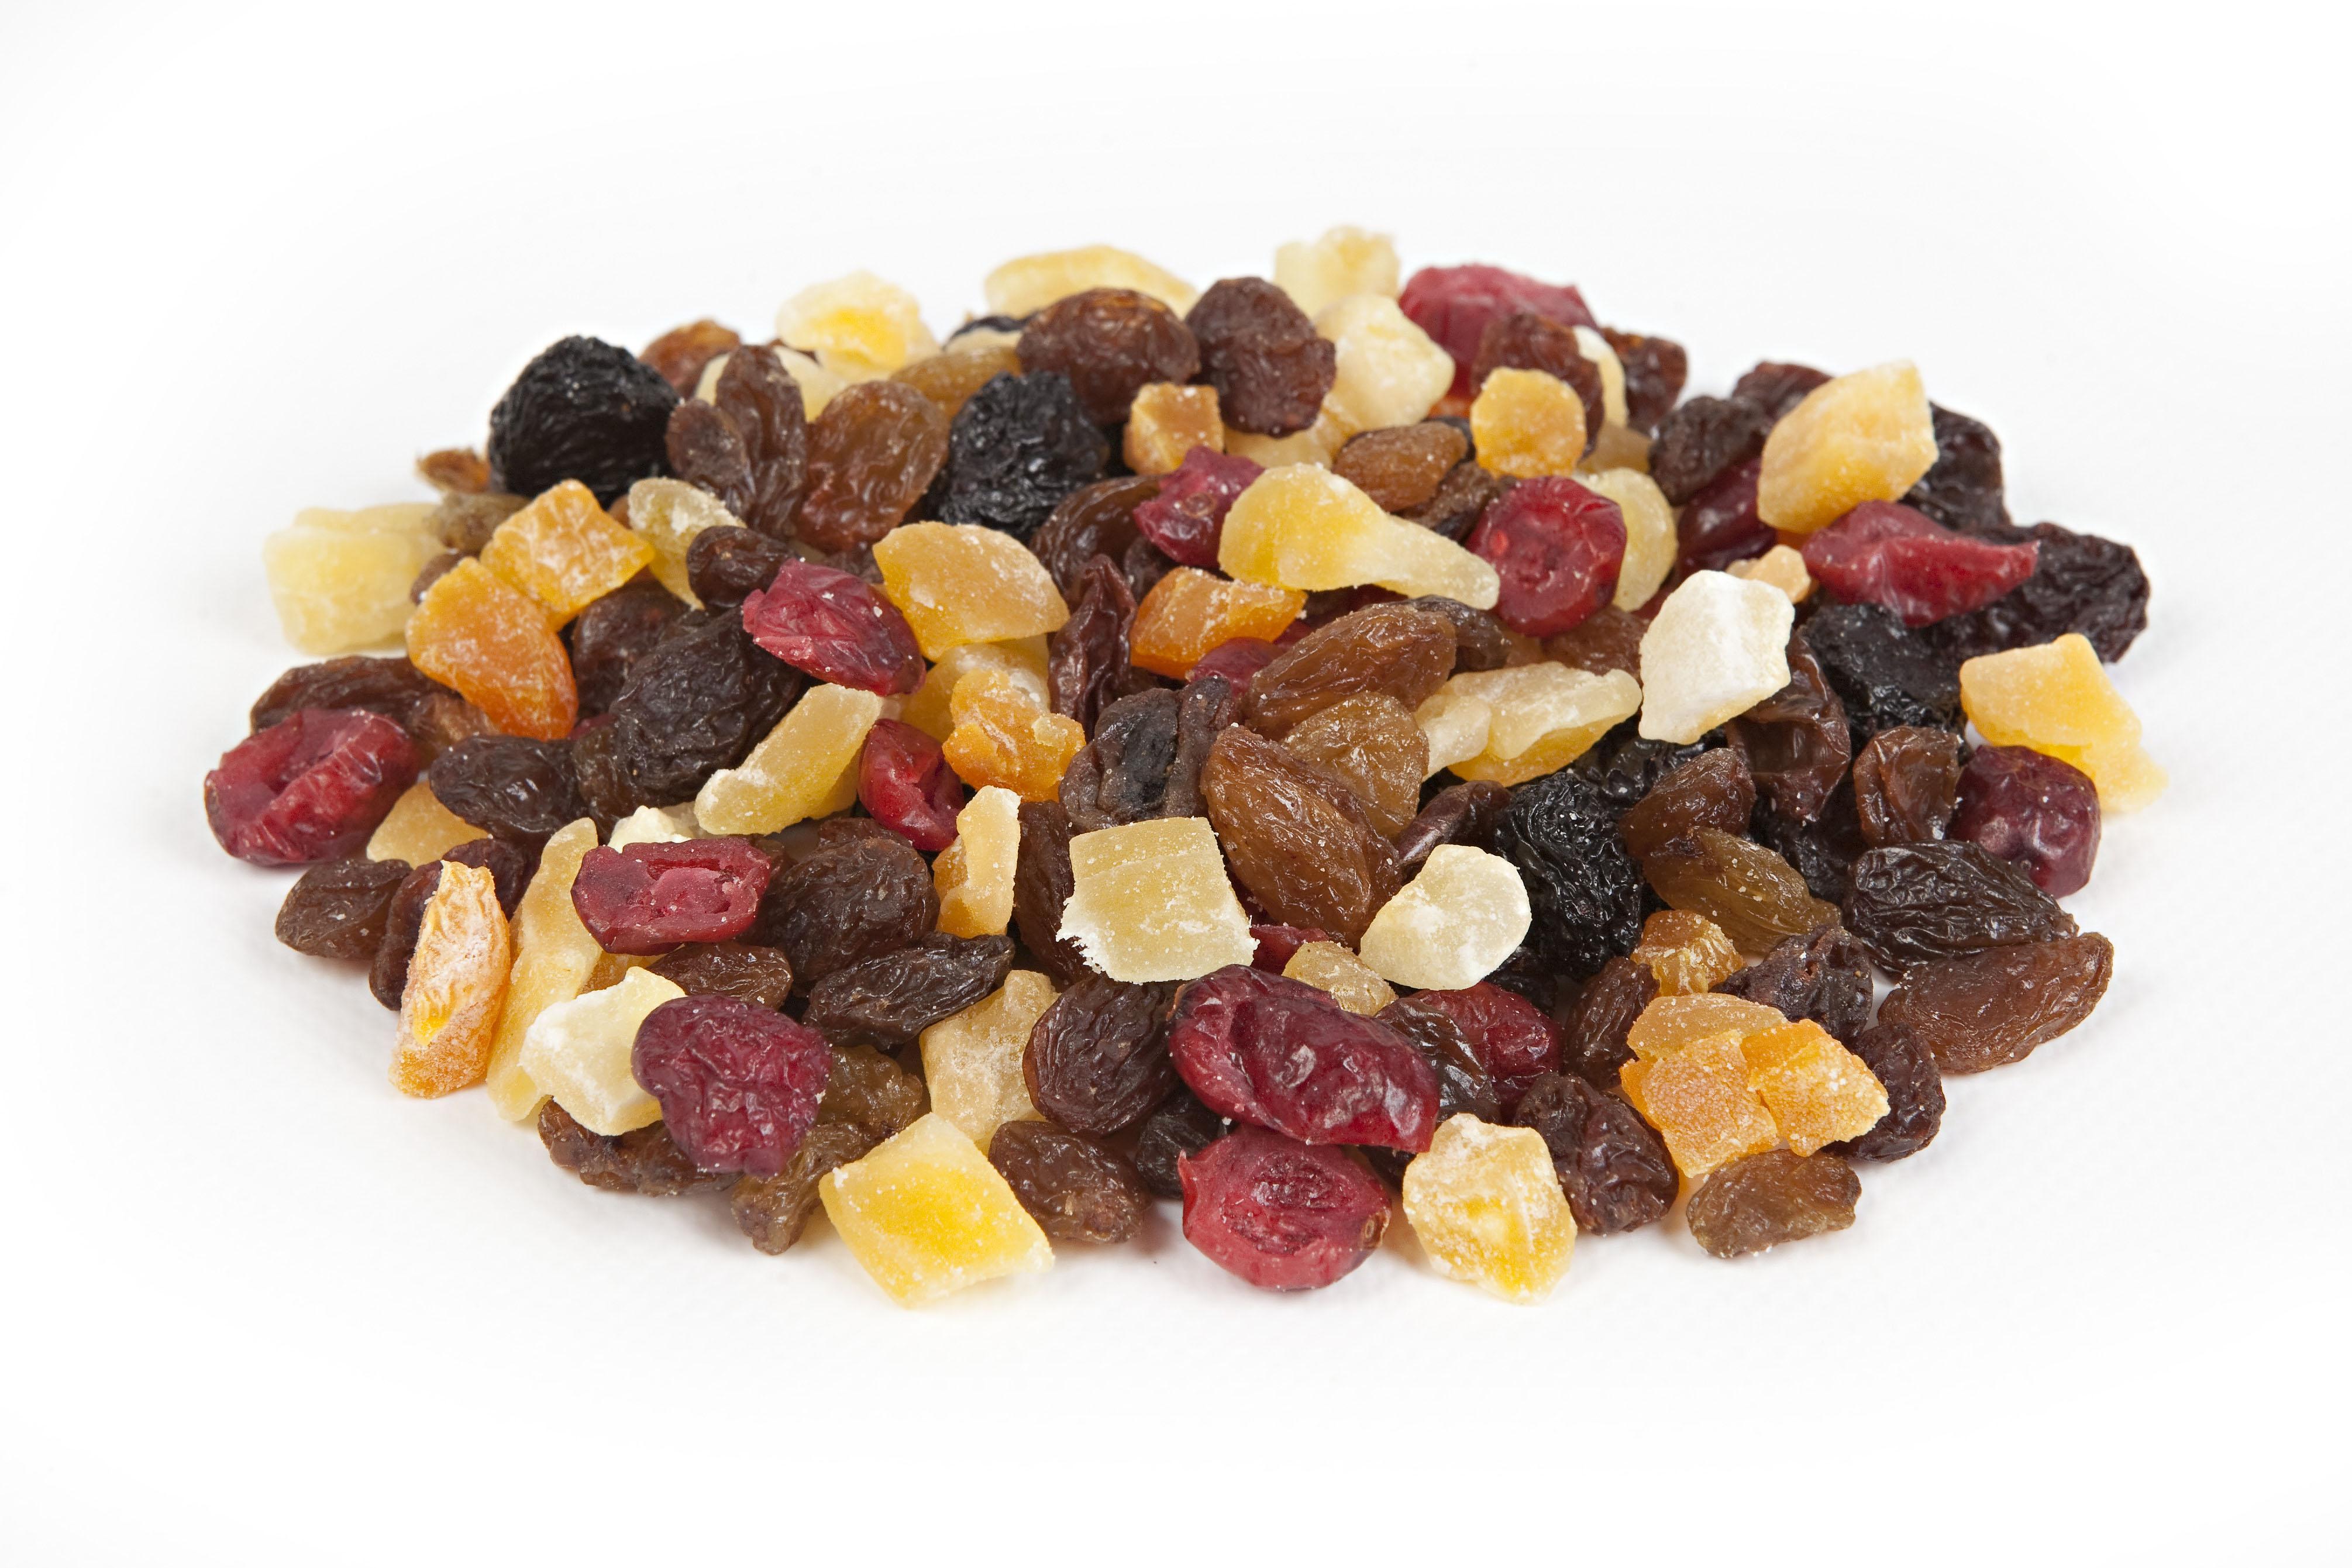 Mixed Fruit Chelmer Foodschelmer Foods